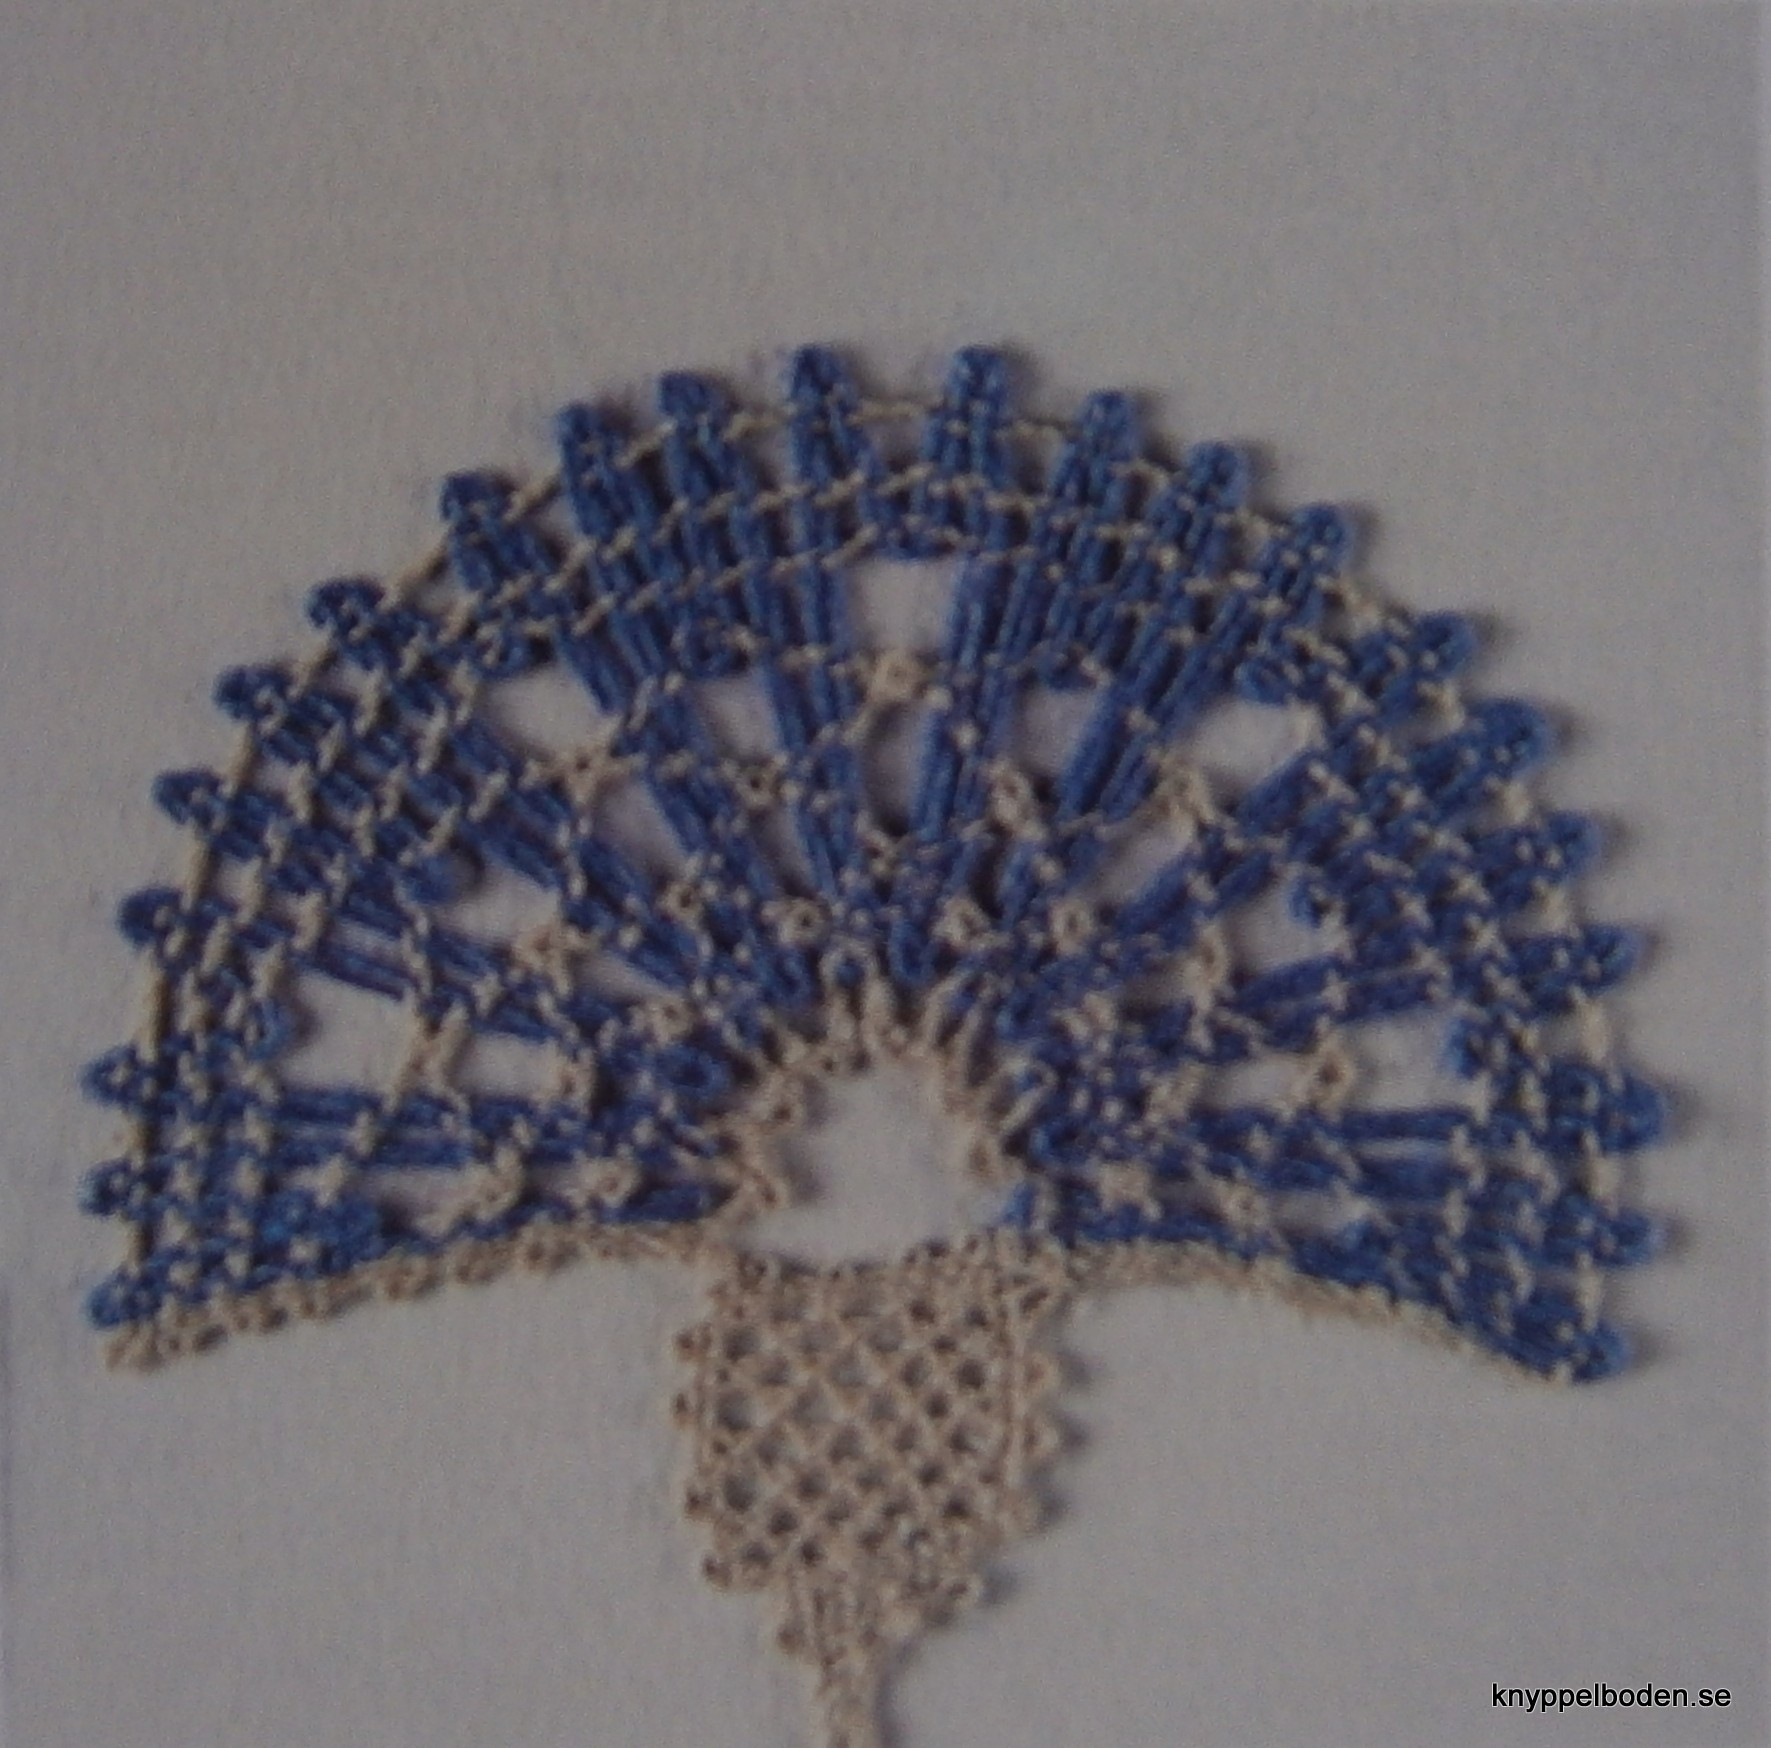 Blåklintsblomma 4,5x4,5 cm